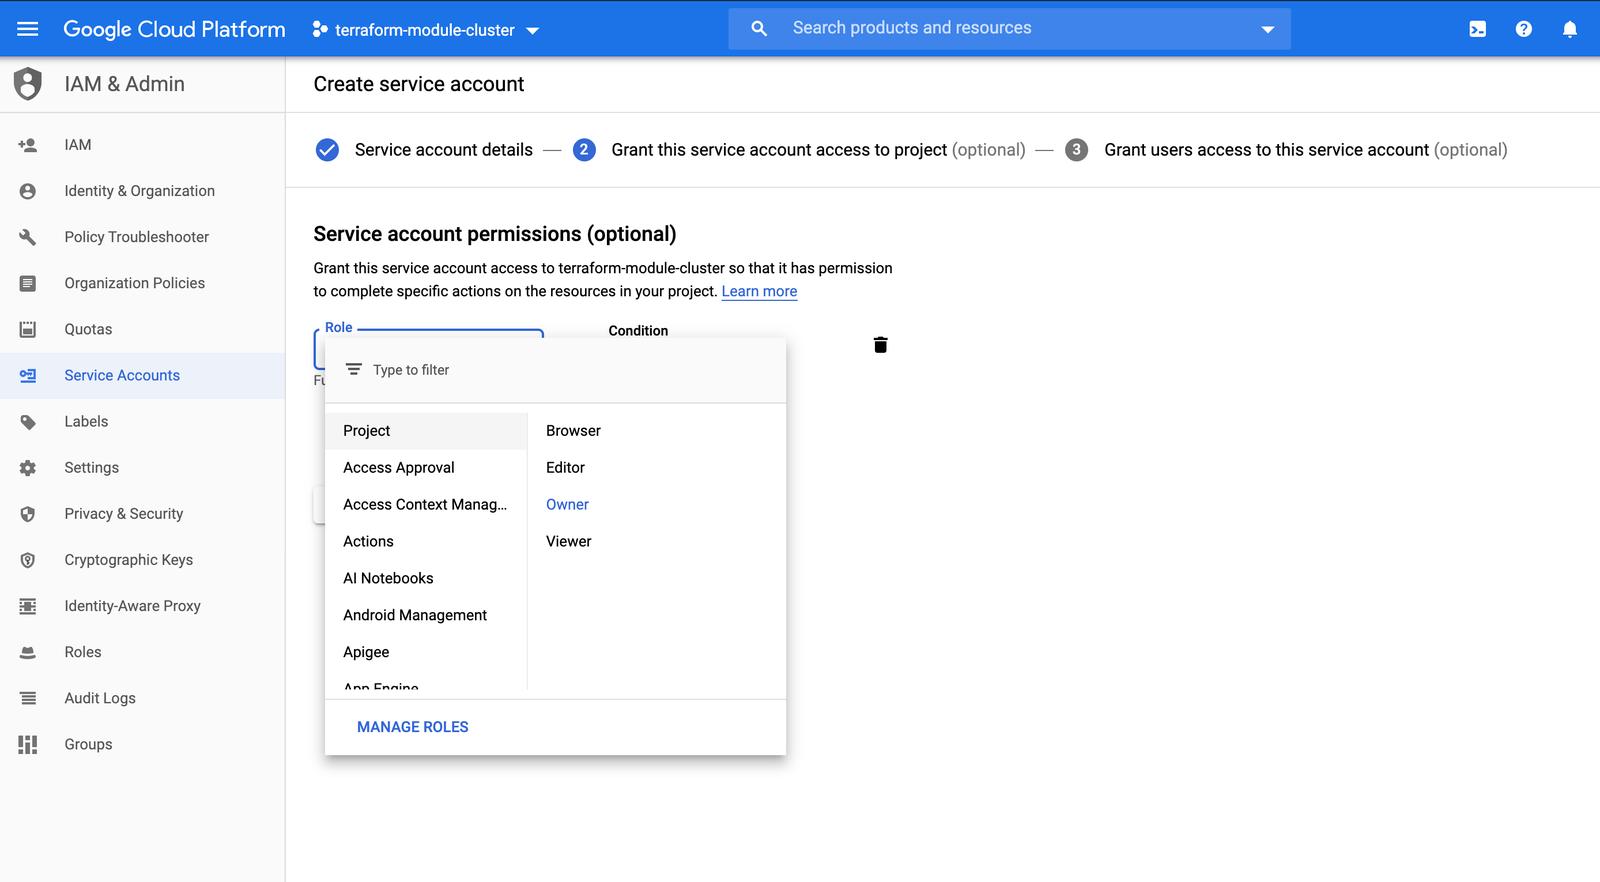 GCP Service Accounts Role ScreenShot